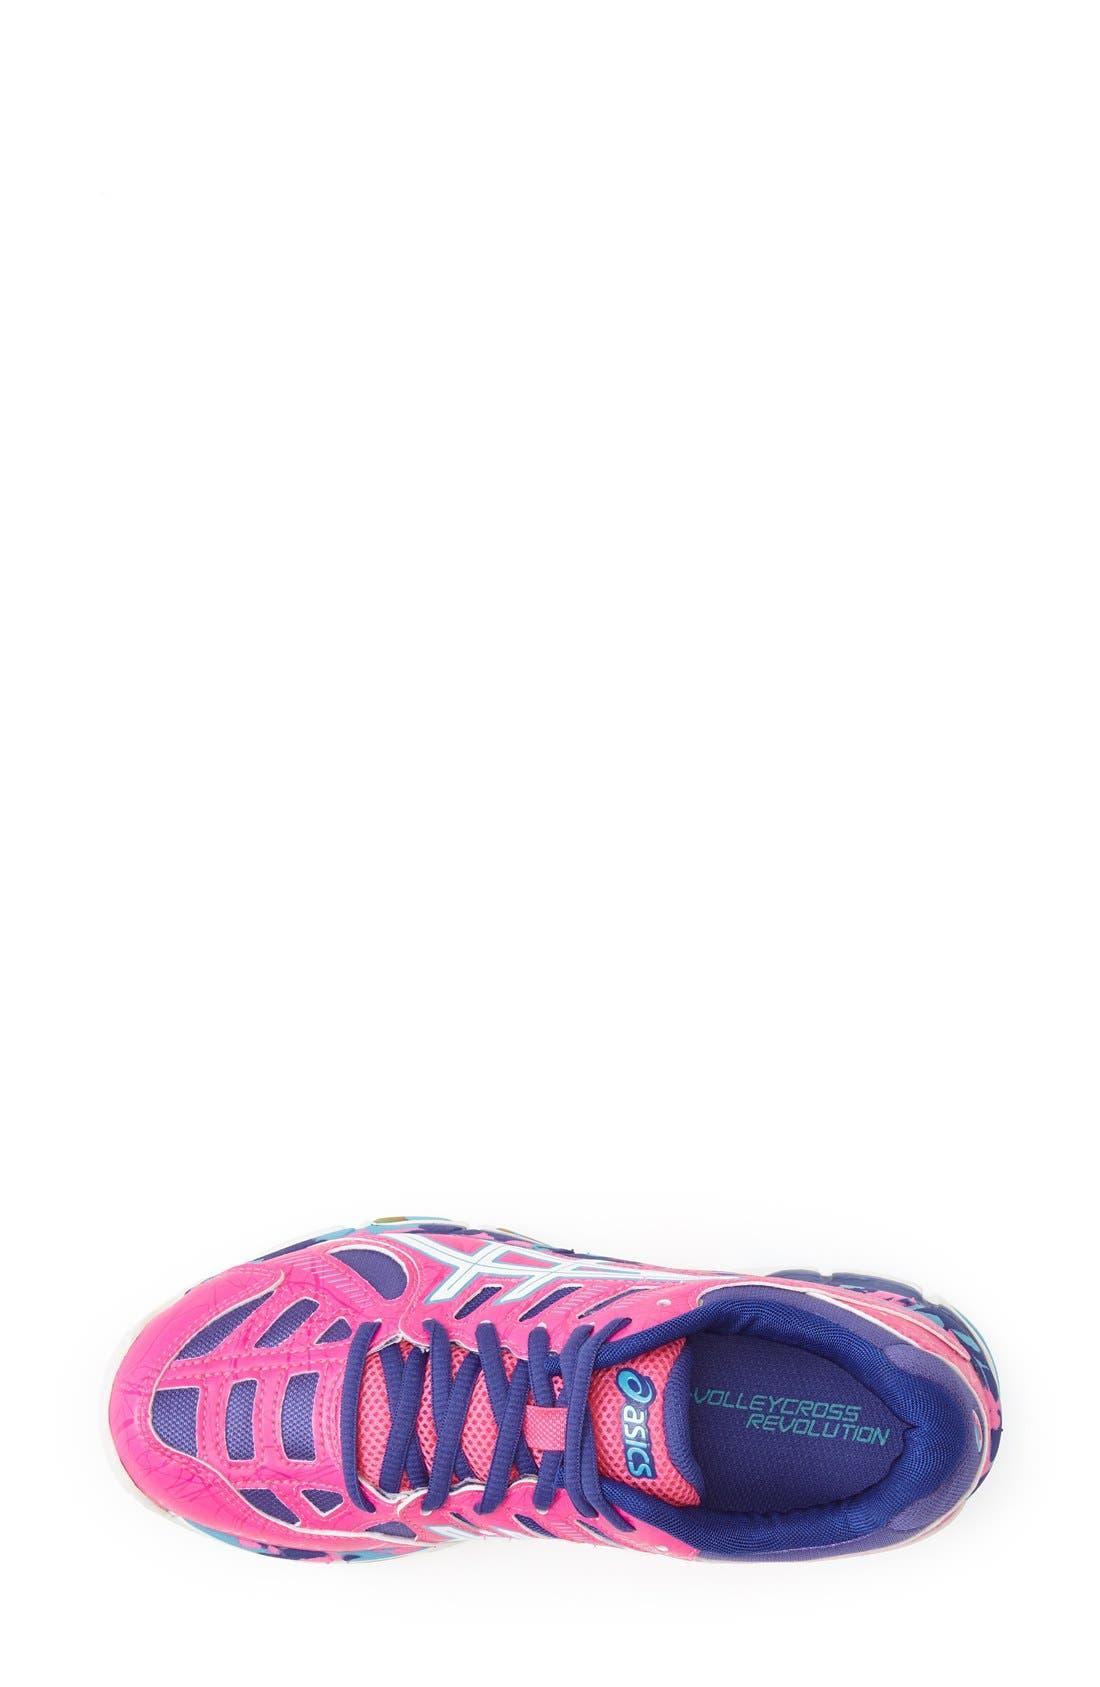 Alternate Image 3  - ASICS® 'GEL-Volleycross® Revolution' Volleyball Shoe (Women) (Regular Retail Price: 109.95)